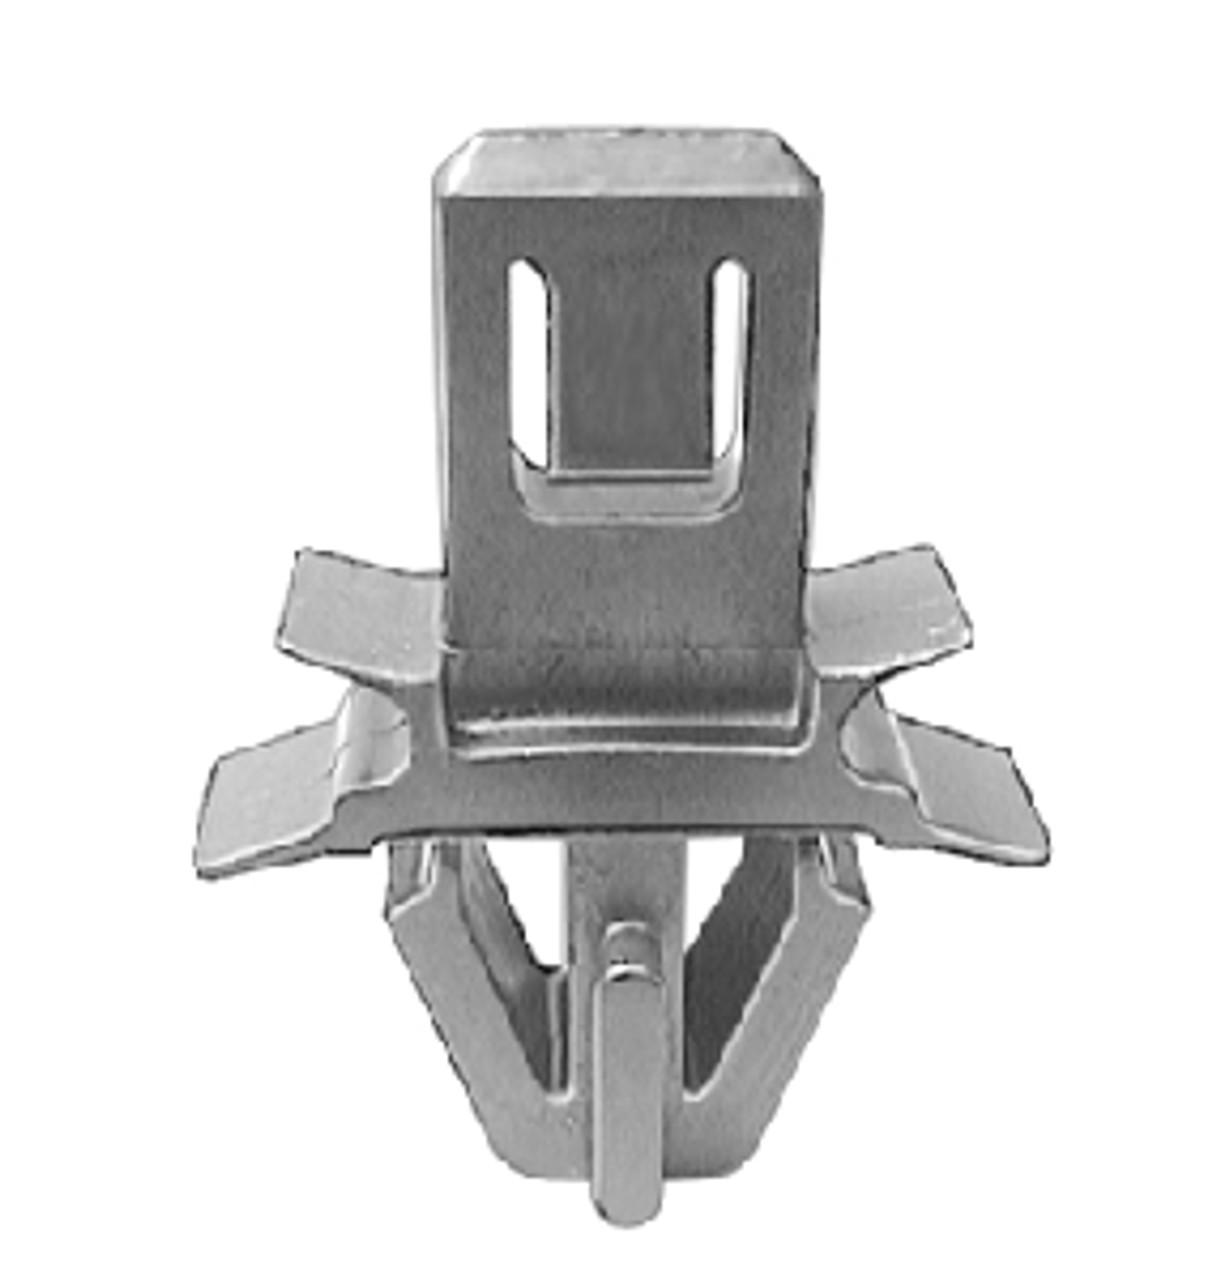 Radiator Grille Retainer Toyota T-100 1992-On OEM# 90904-67021 Black Nylon 15 Per Box Click Next Image For Clip Detail